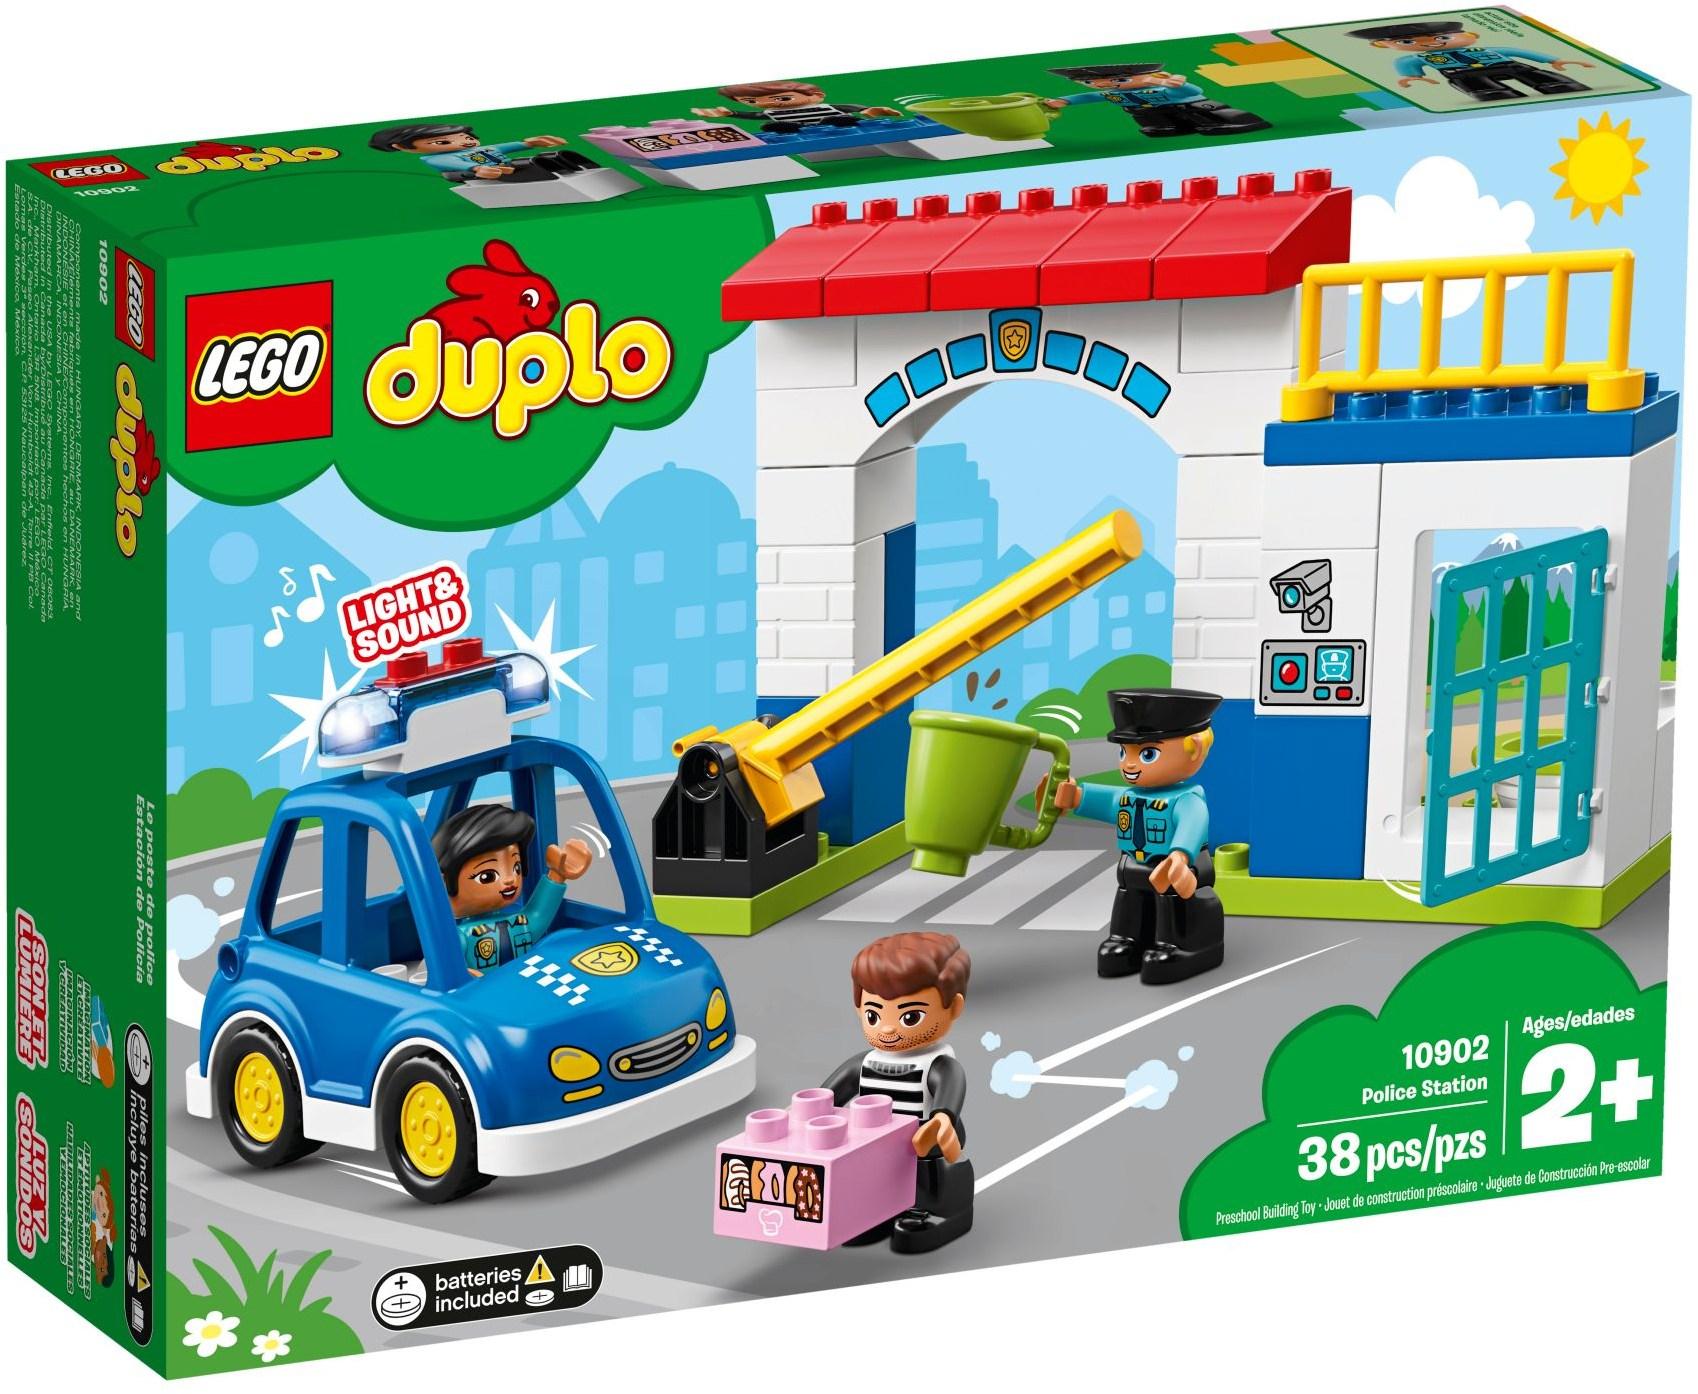 LEGO Police Station - 10902